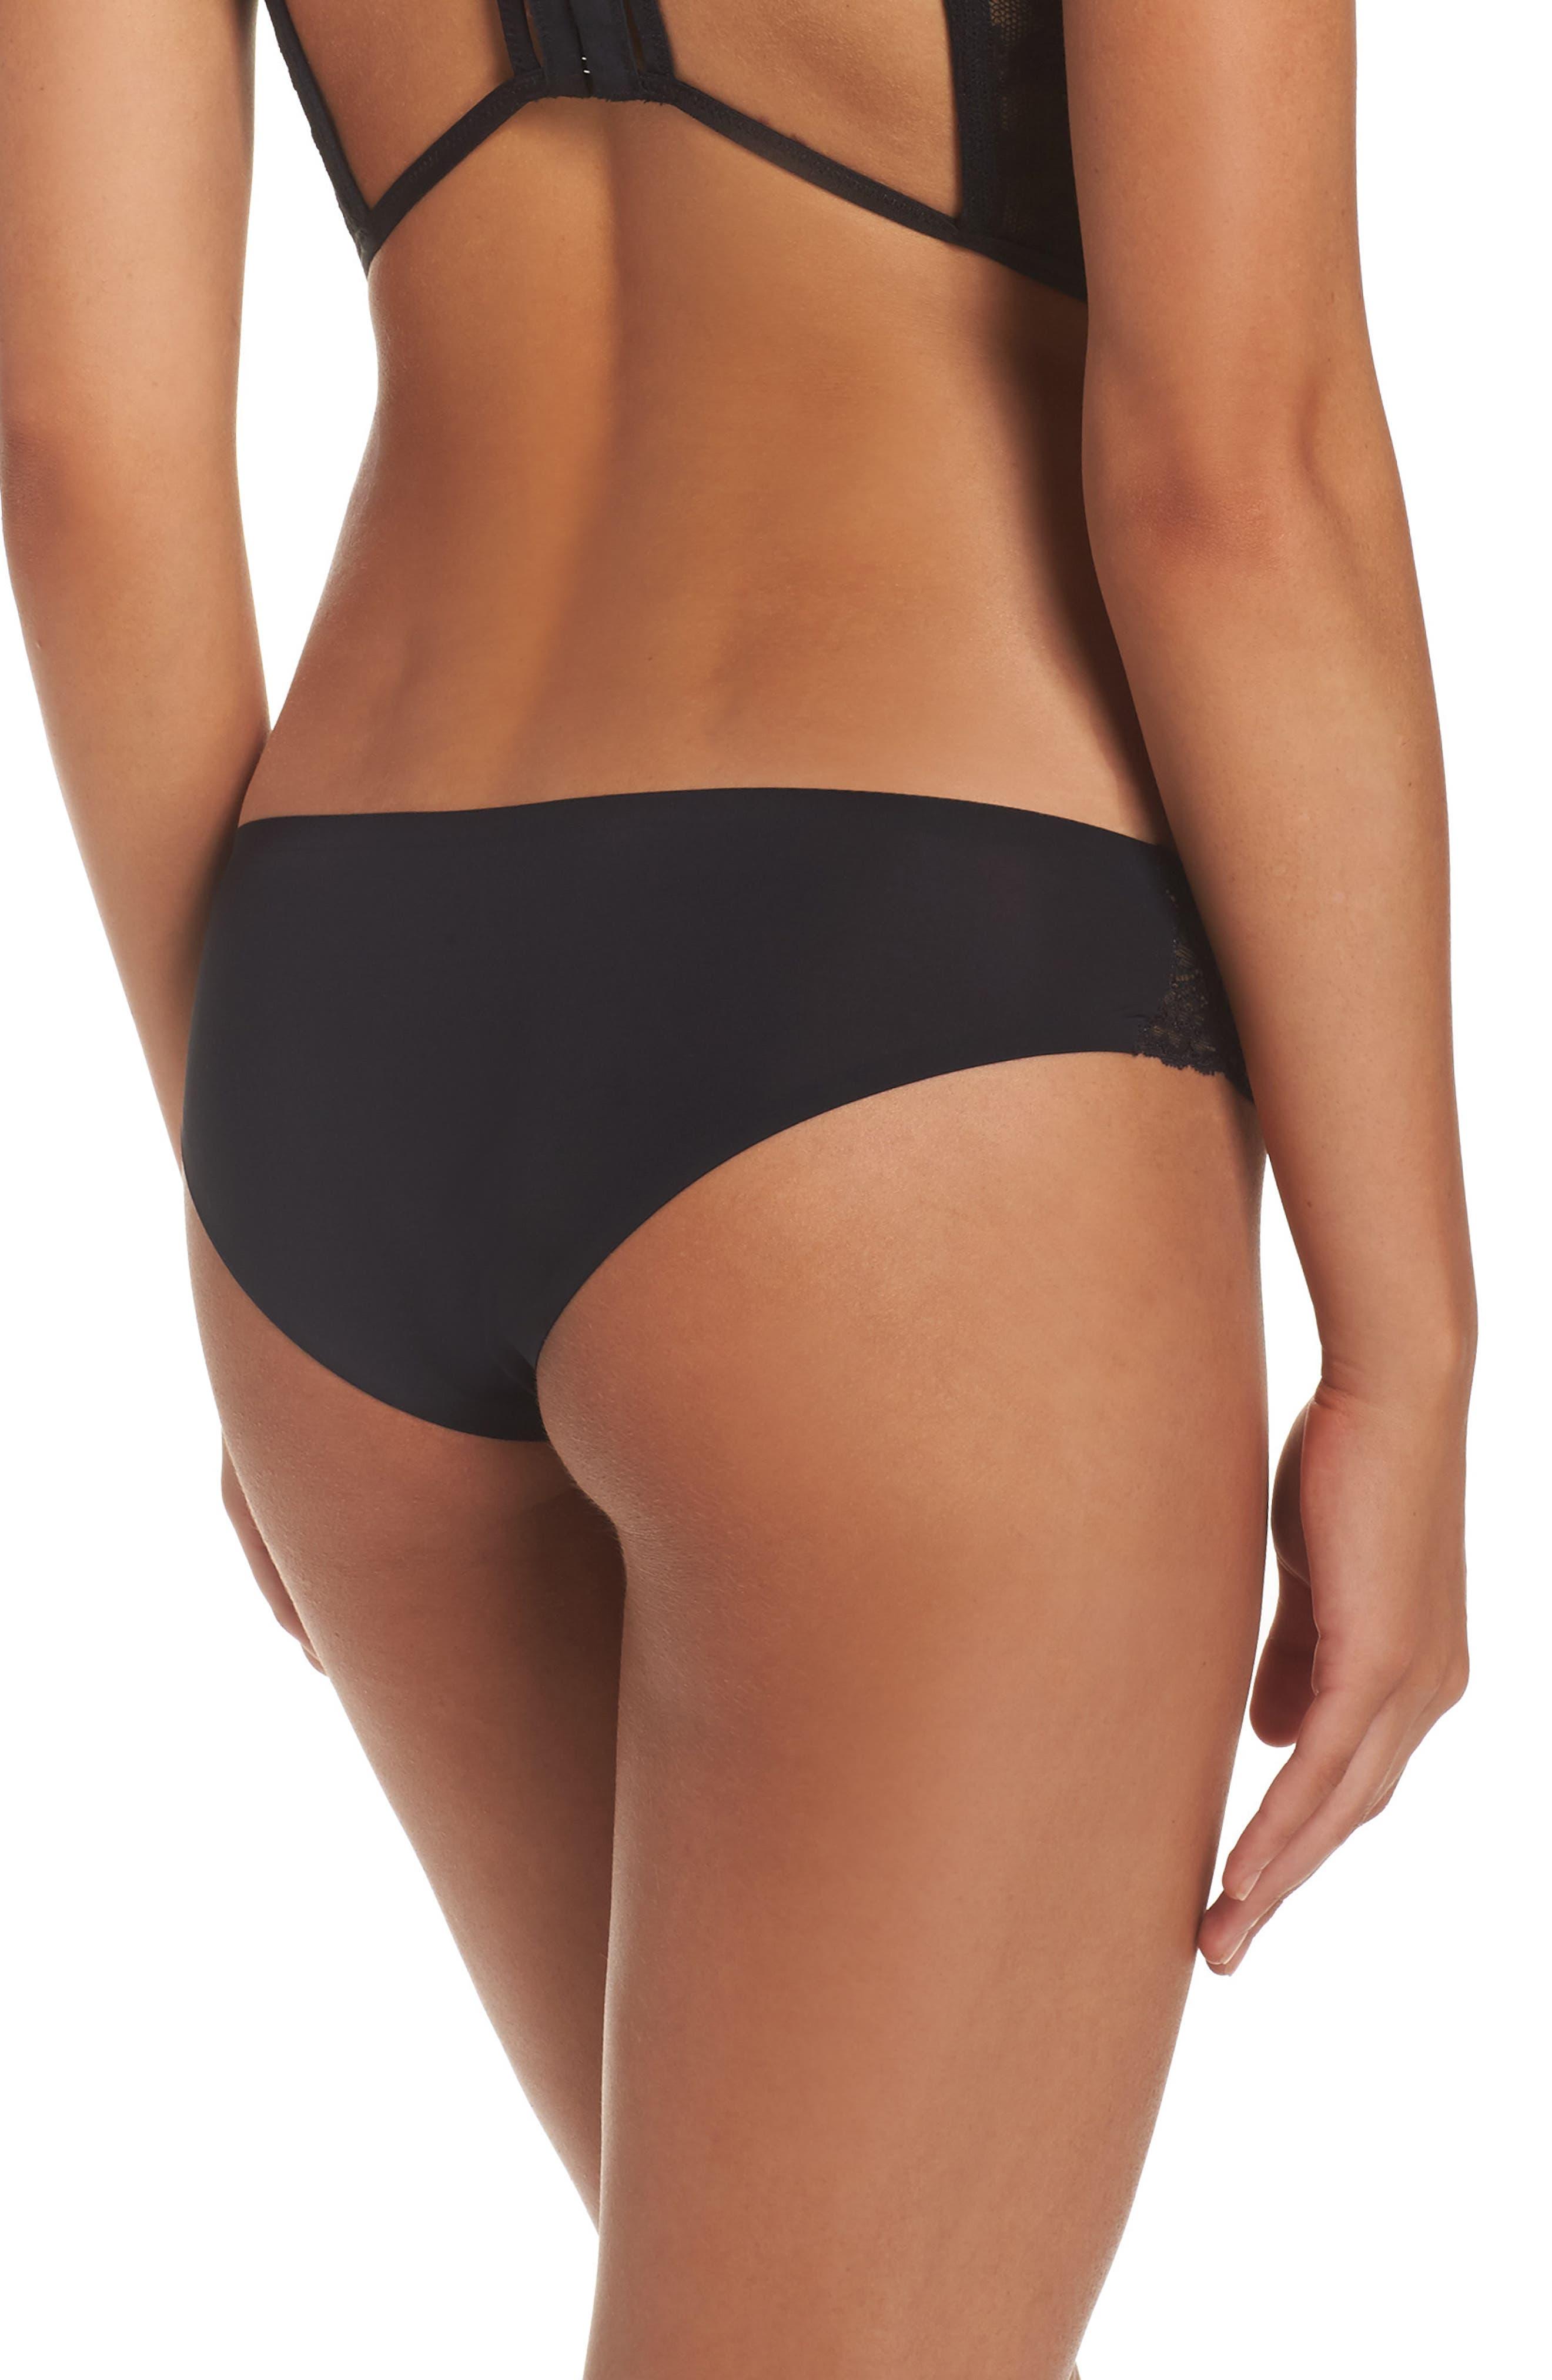 Intimately FP Smooth Bikini,                             Alternate thumbnail 2, color,                             001